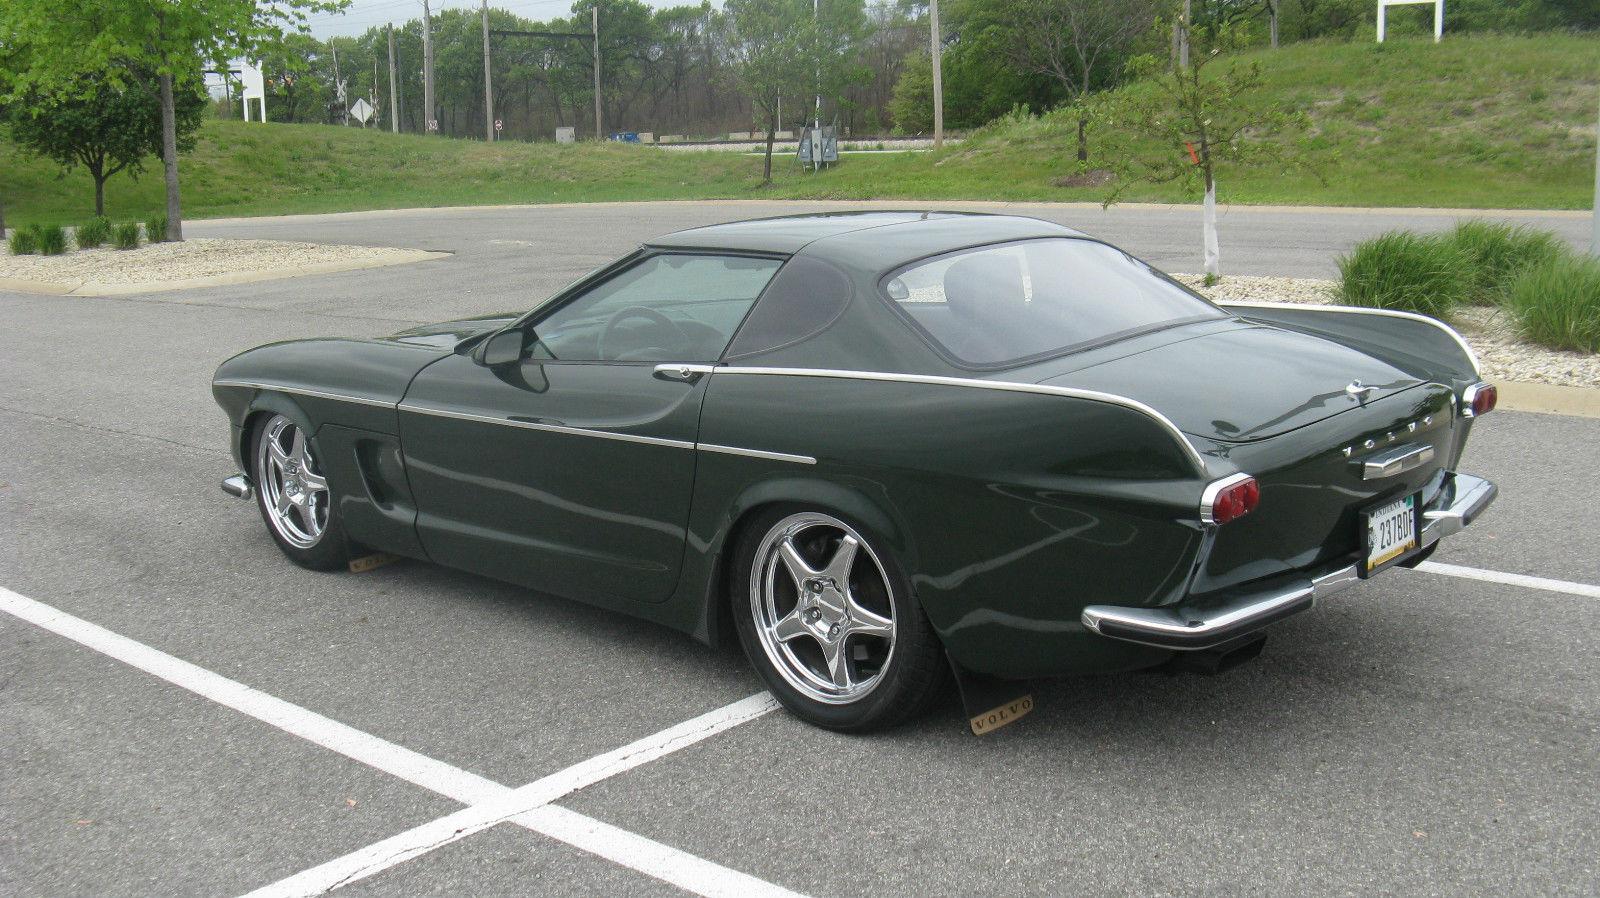 Volvette Is A 1992 Corvette With A 1967 Volvo P1800 Body ...